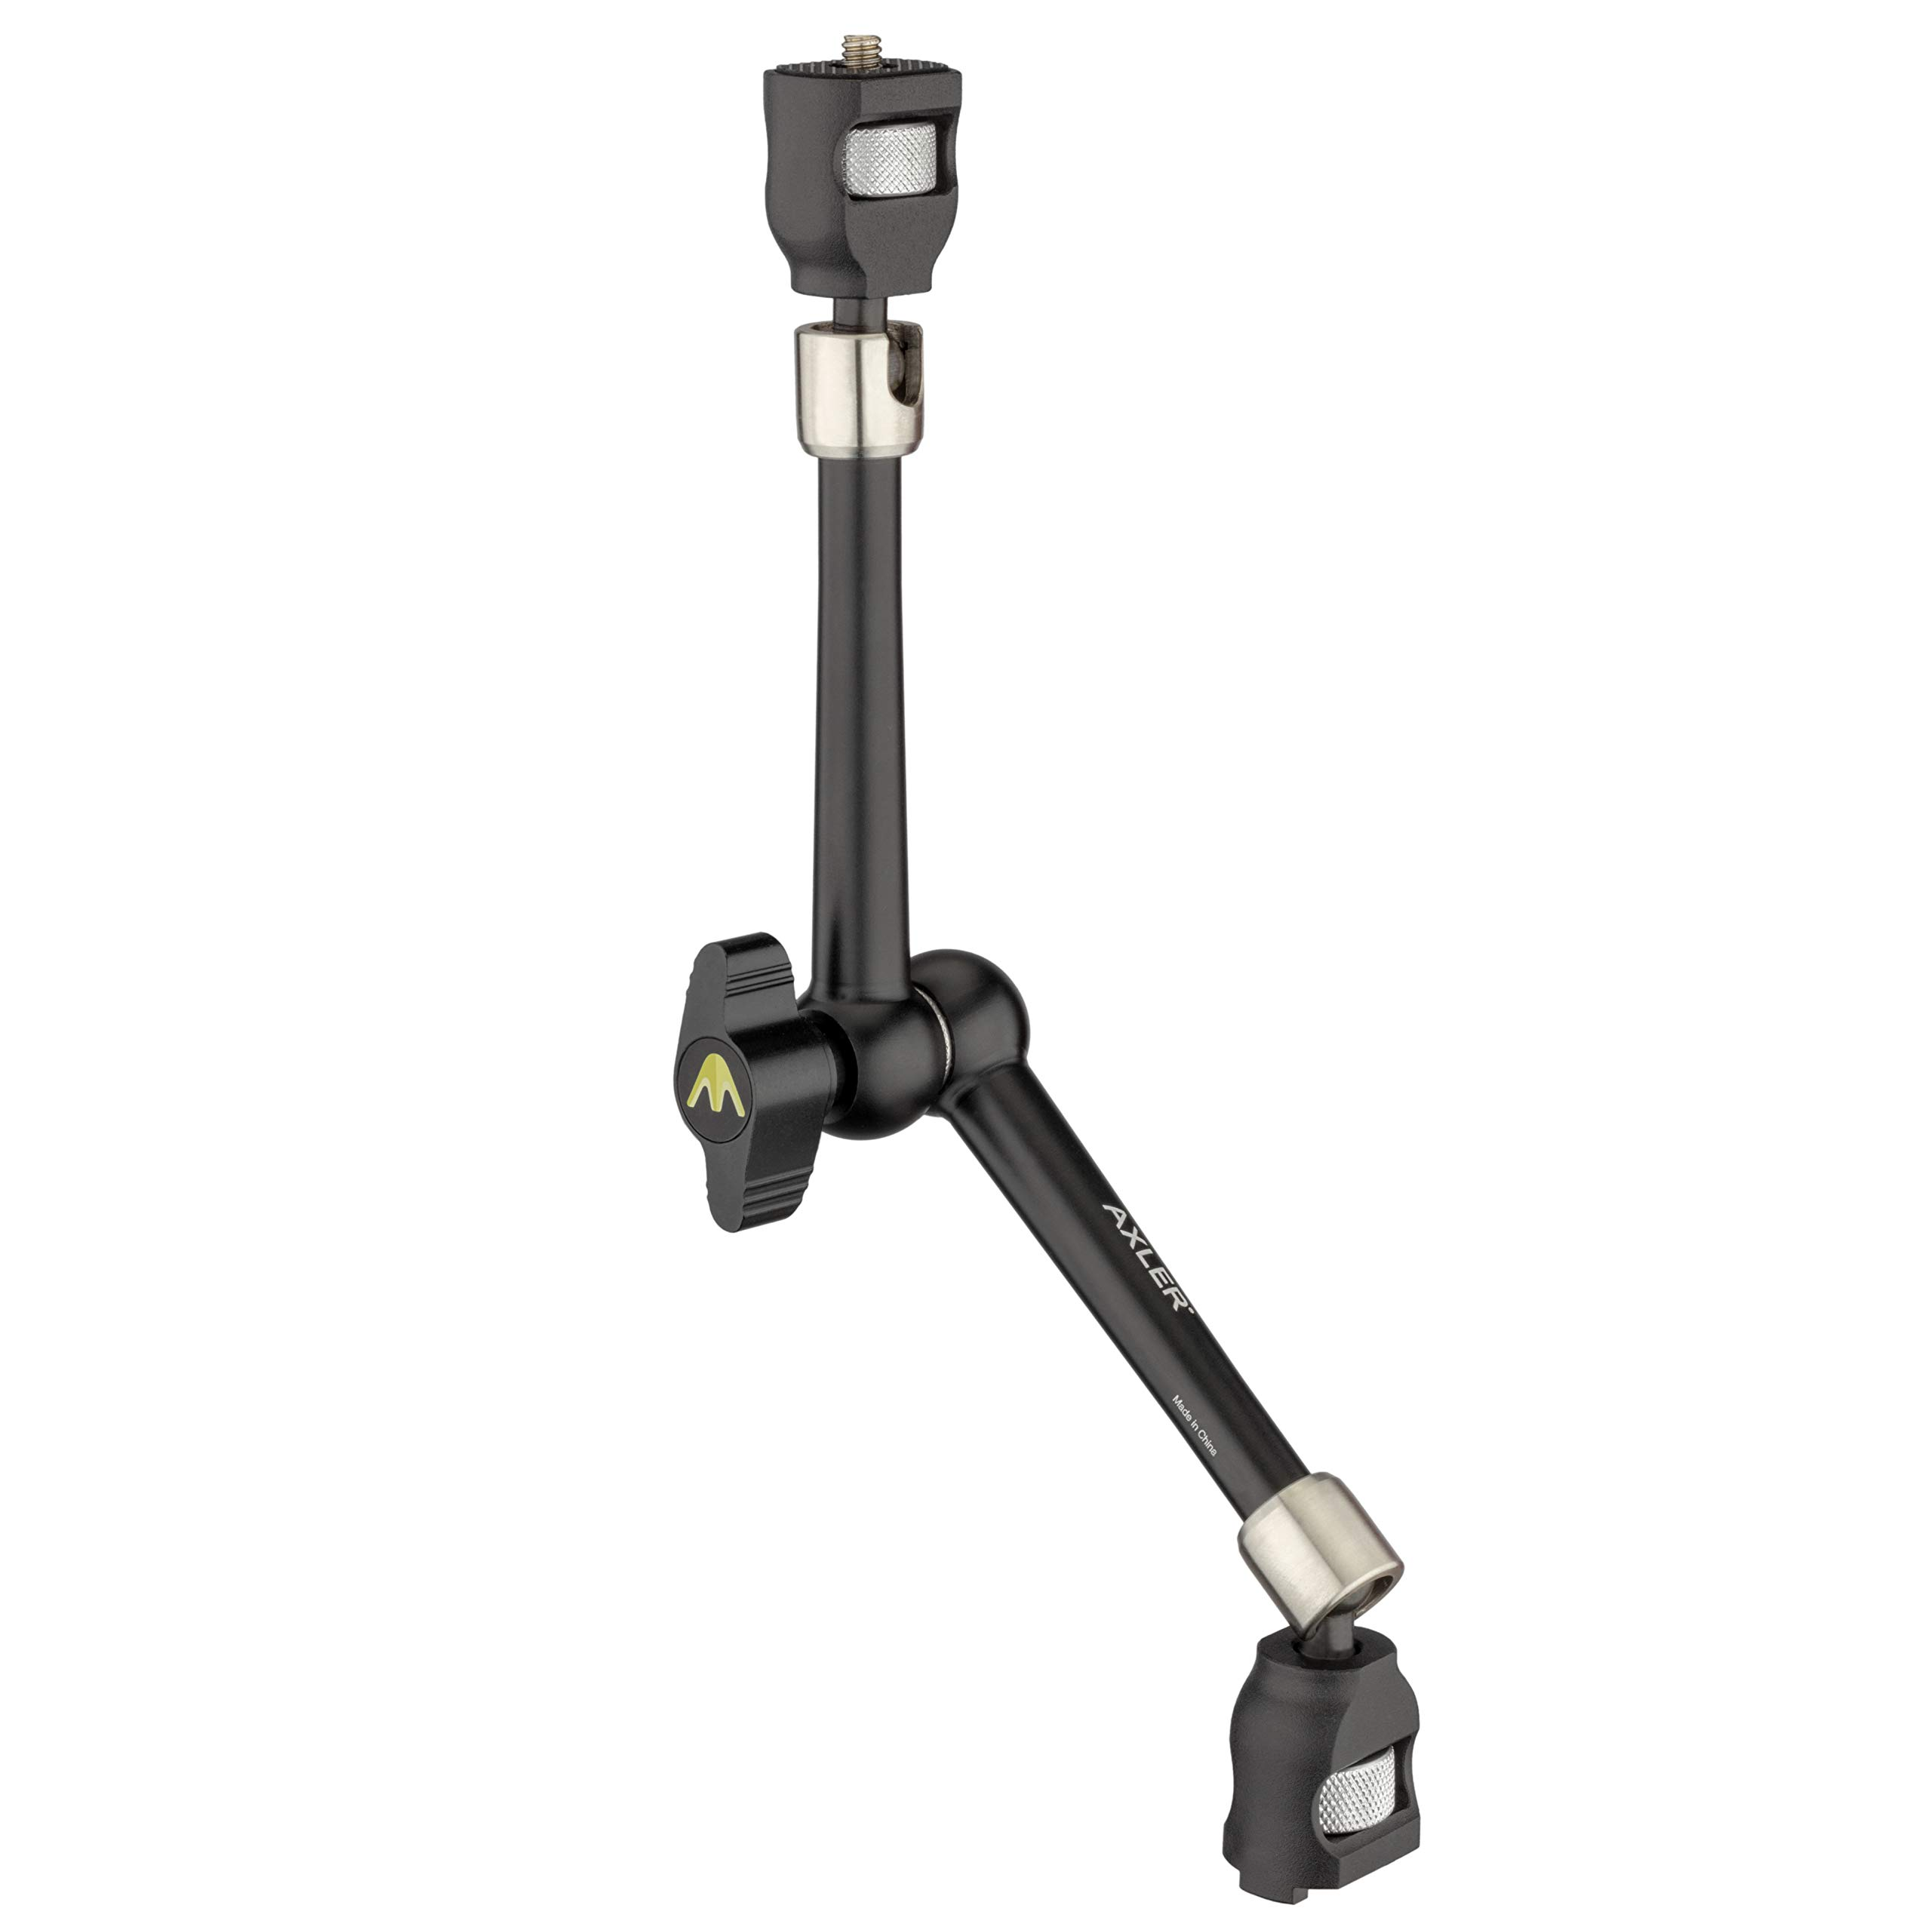 Axler RECODO 11'' Arm with 1/4''-20 to 3/8''-16 Anti-Twist Fitting